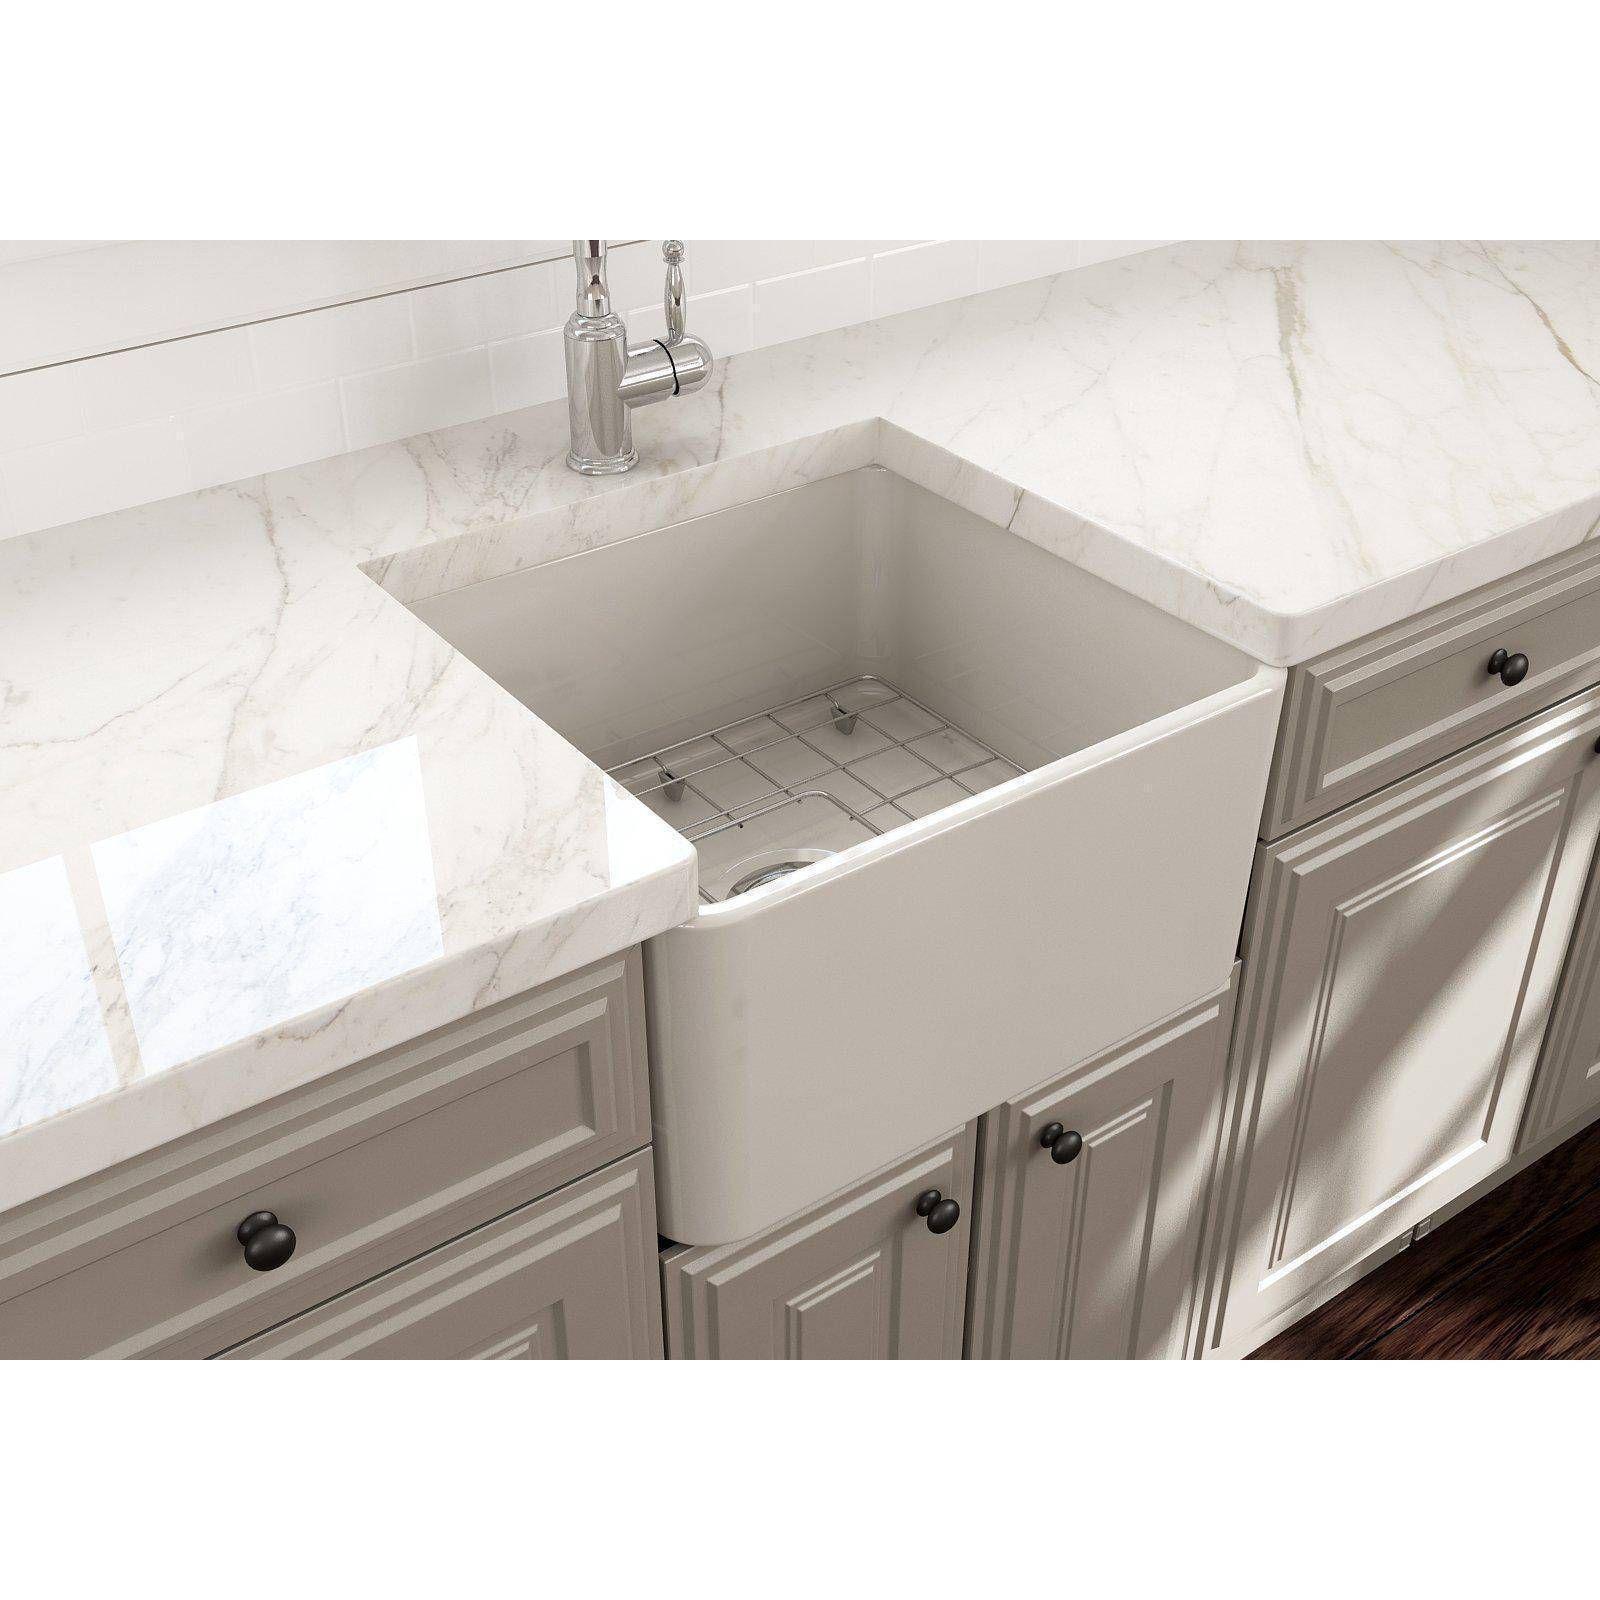 Bocchi Classico 20 White Fireclay Single Bowl Farmhouse Sink W